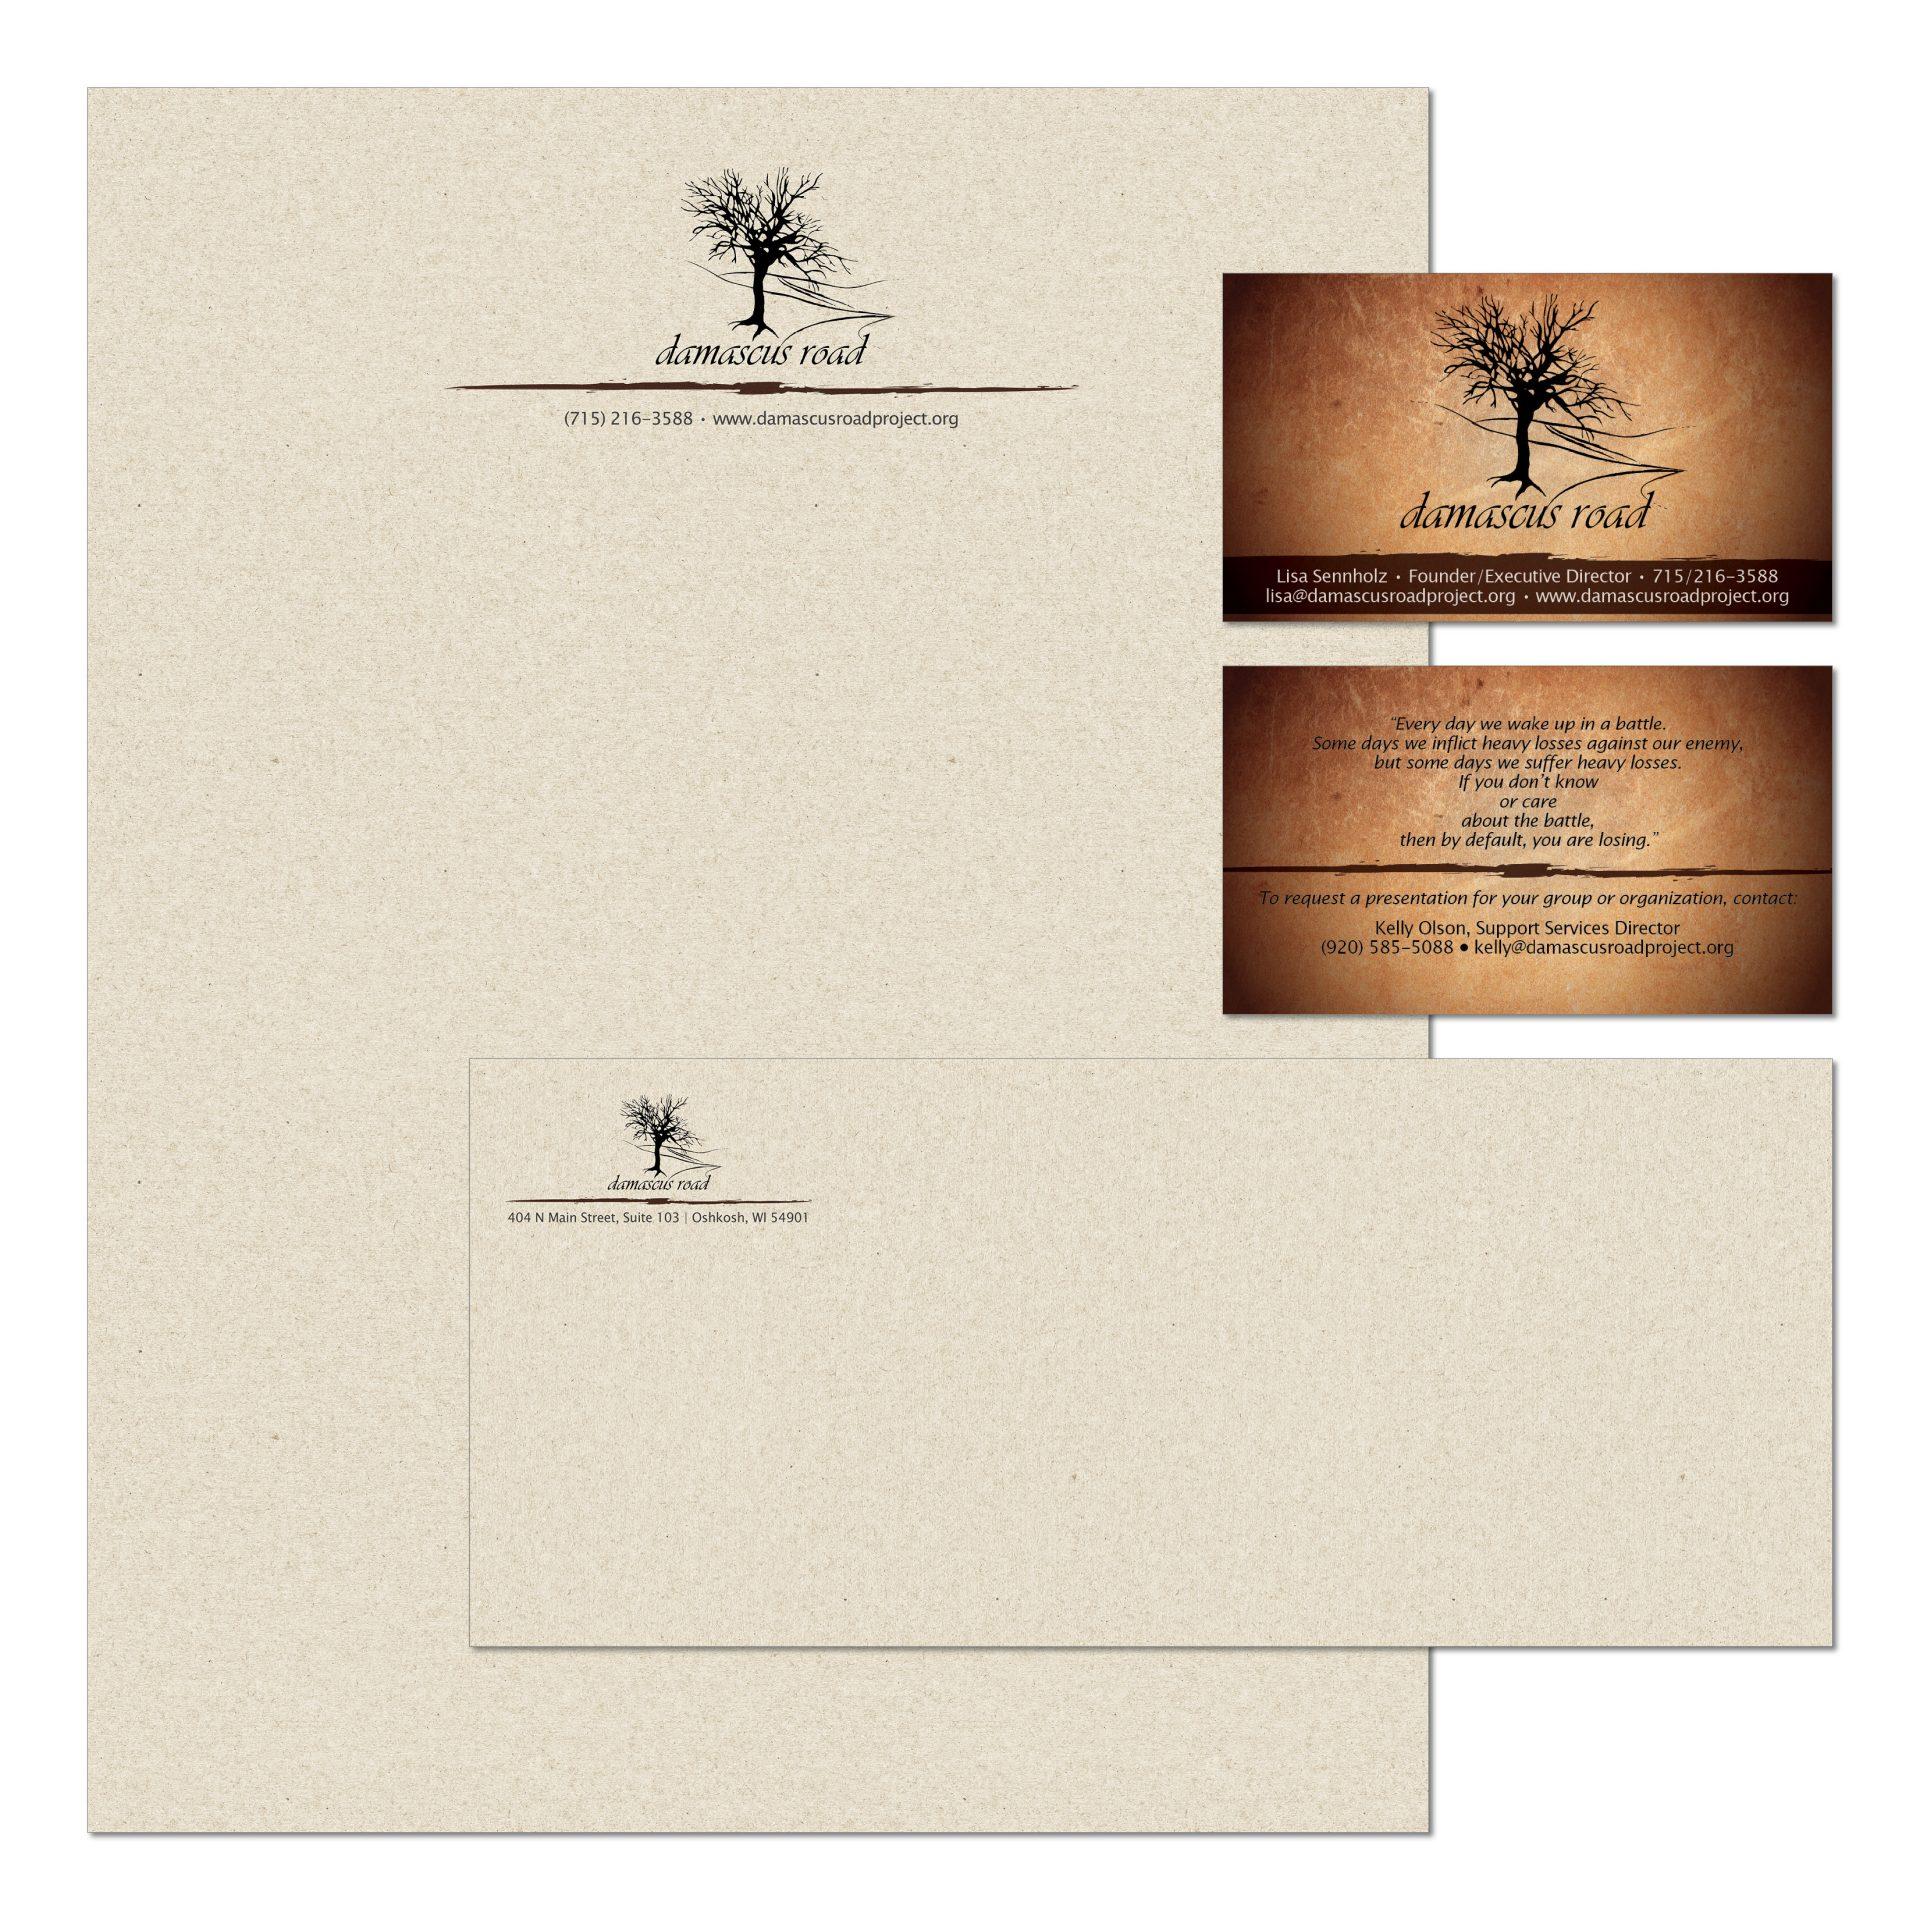 2013 | Damascus Road Project | logo, business card, letterhead, envelope